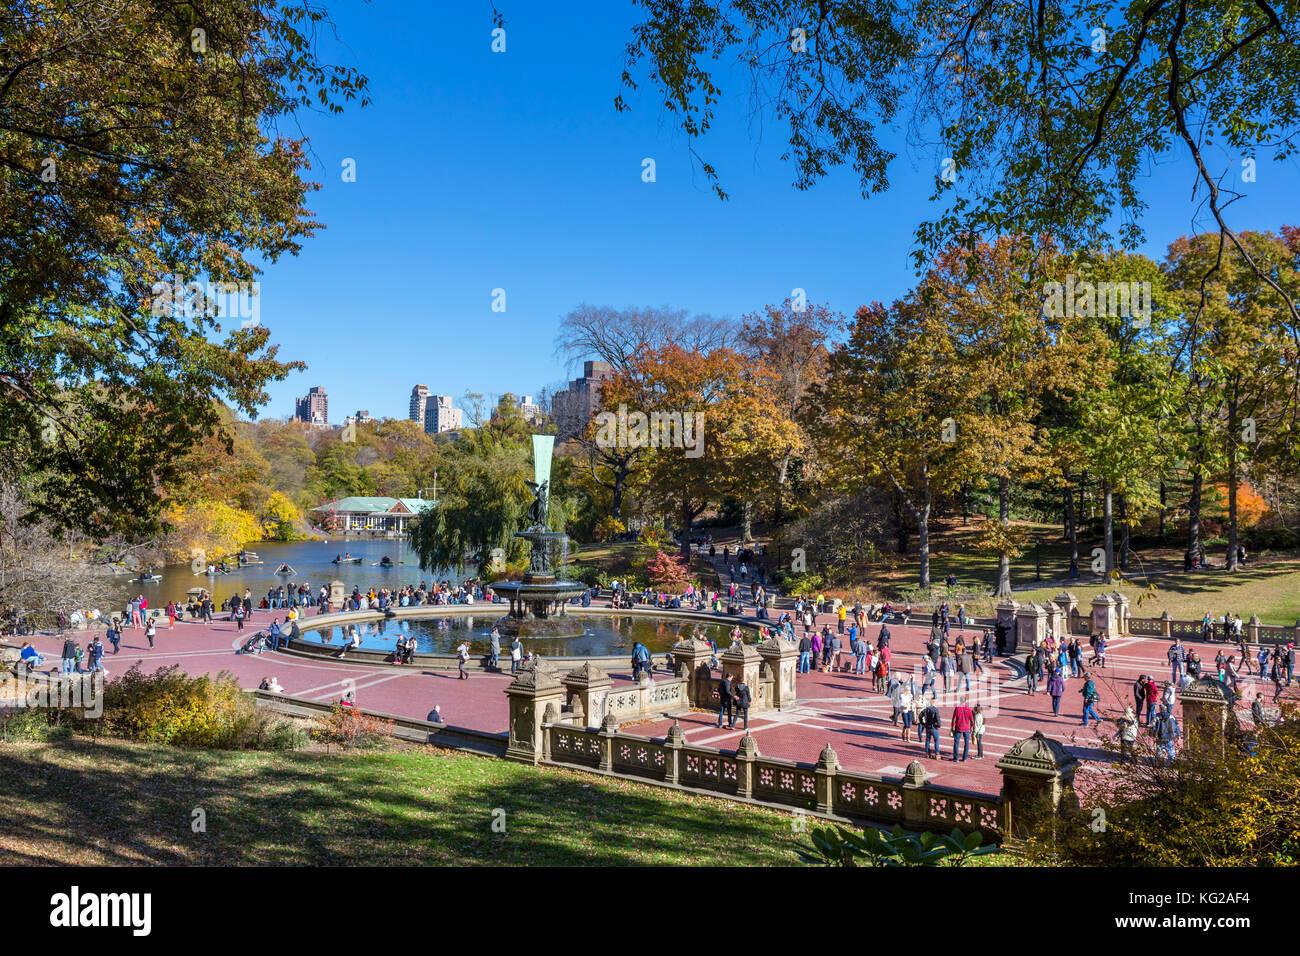 Bethesda Fountain, Central Park, New York City, NY, USA Stockbild